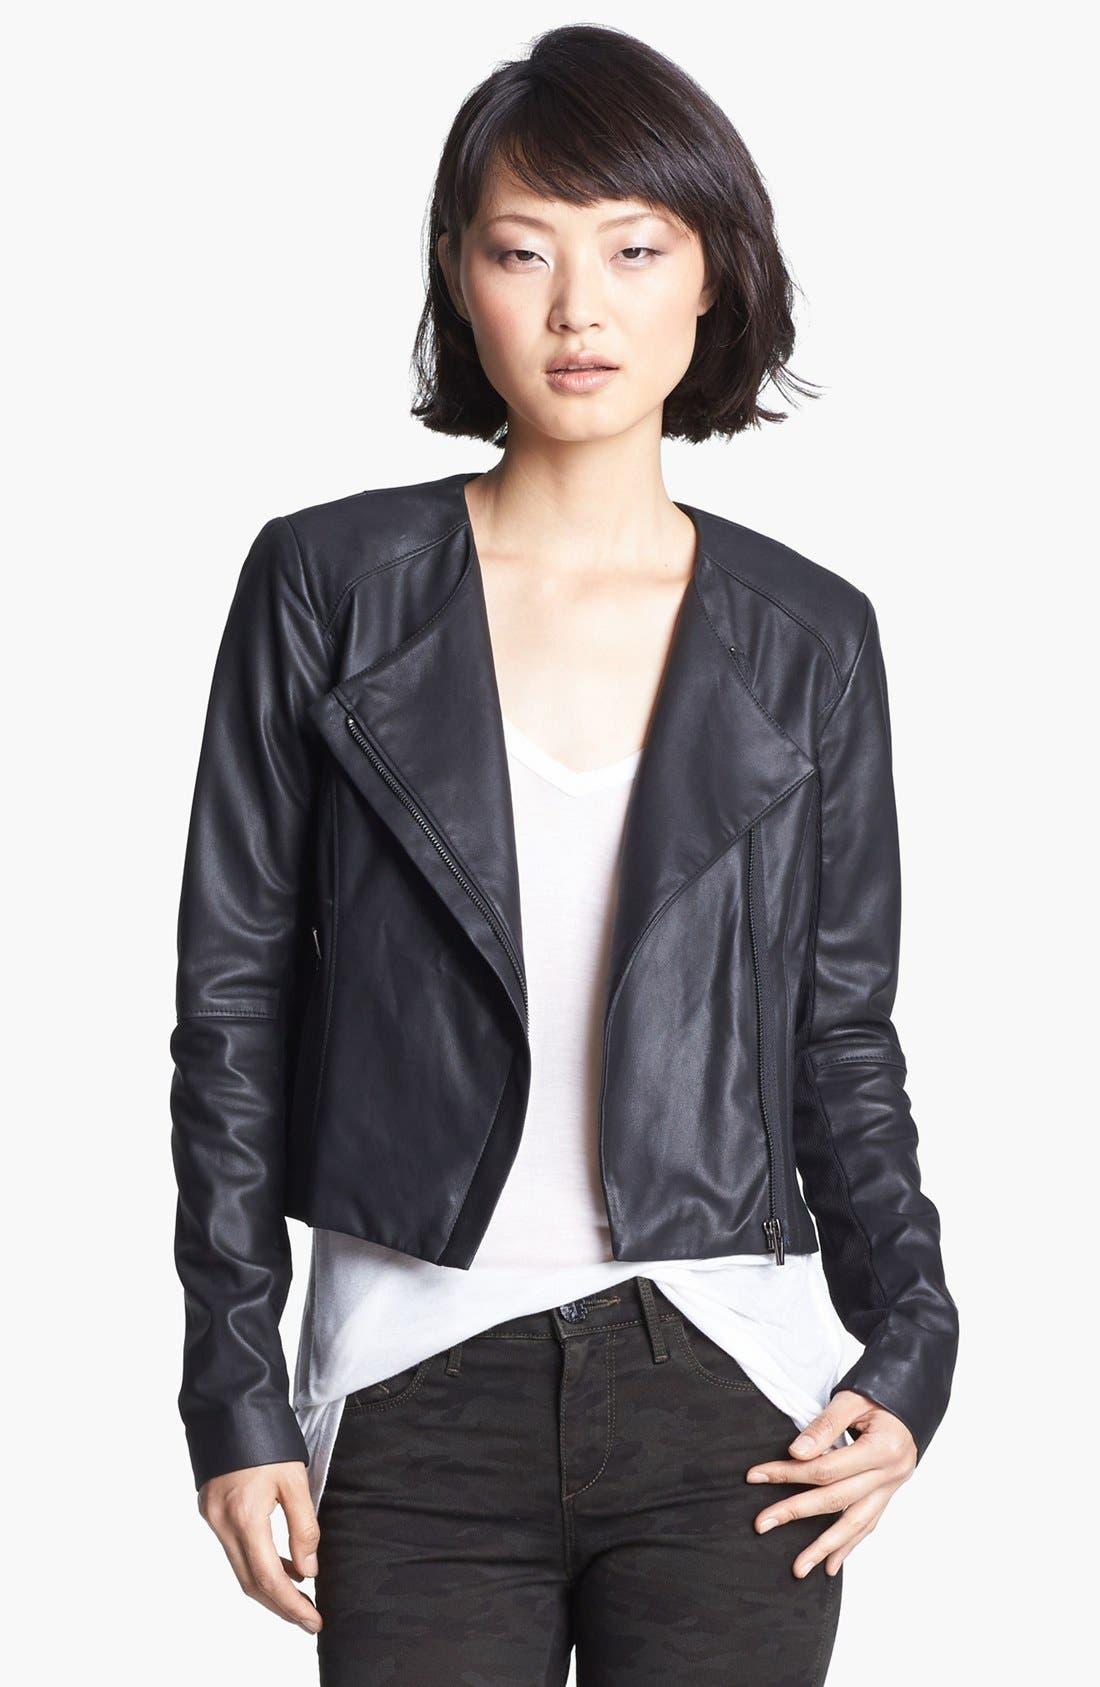 Alternate Image 1 Selected - Veda 'Dali' Leather Jacket